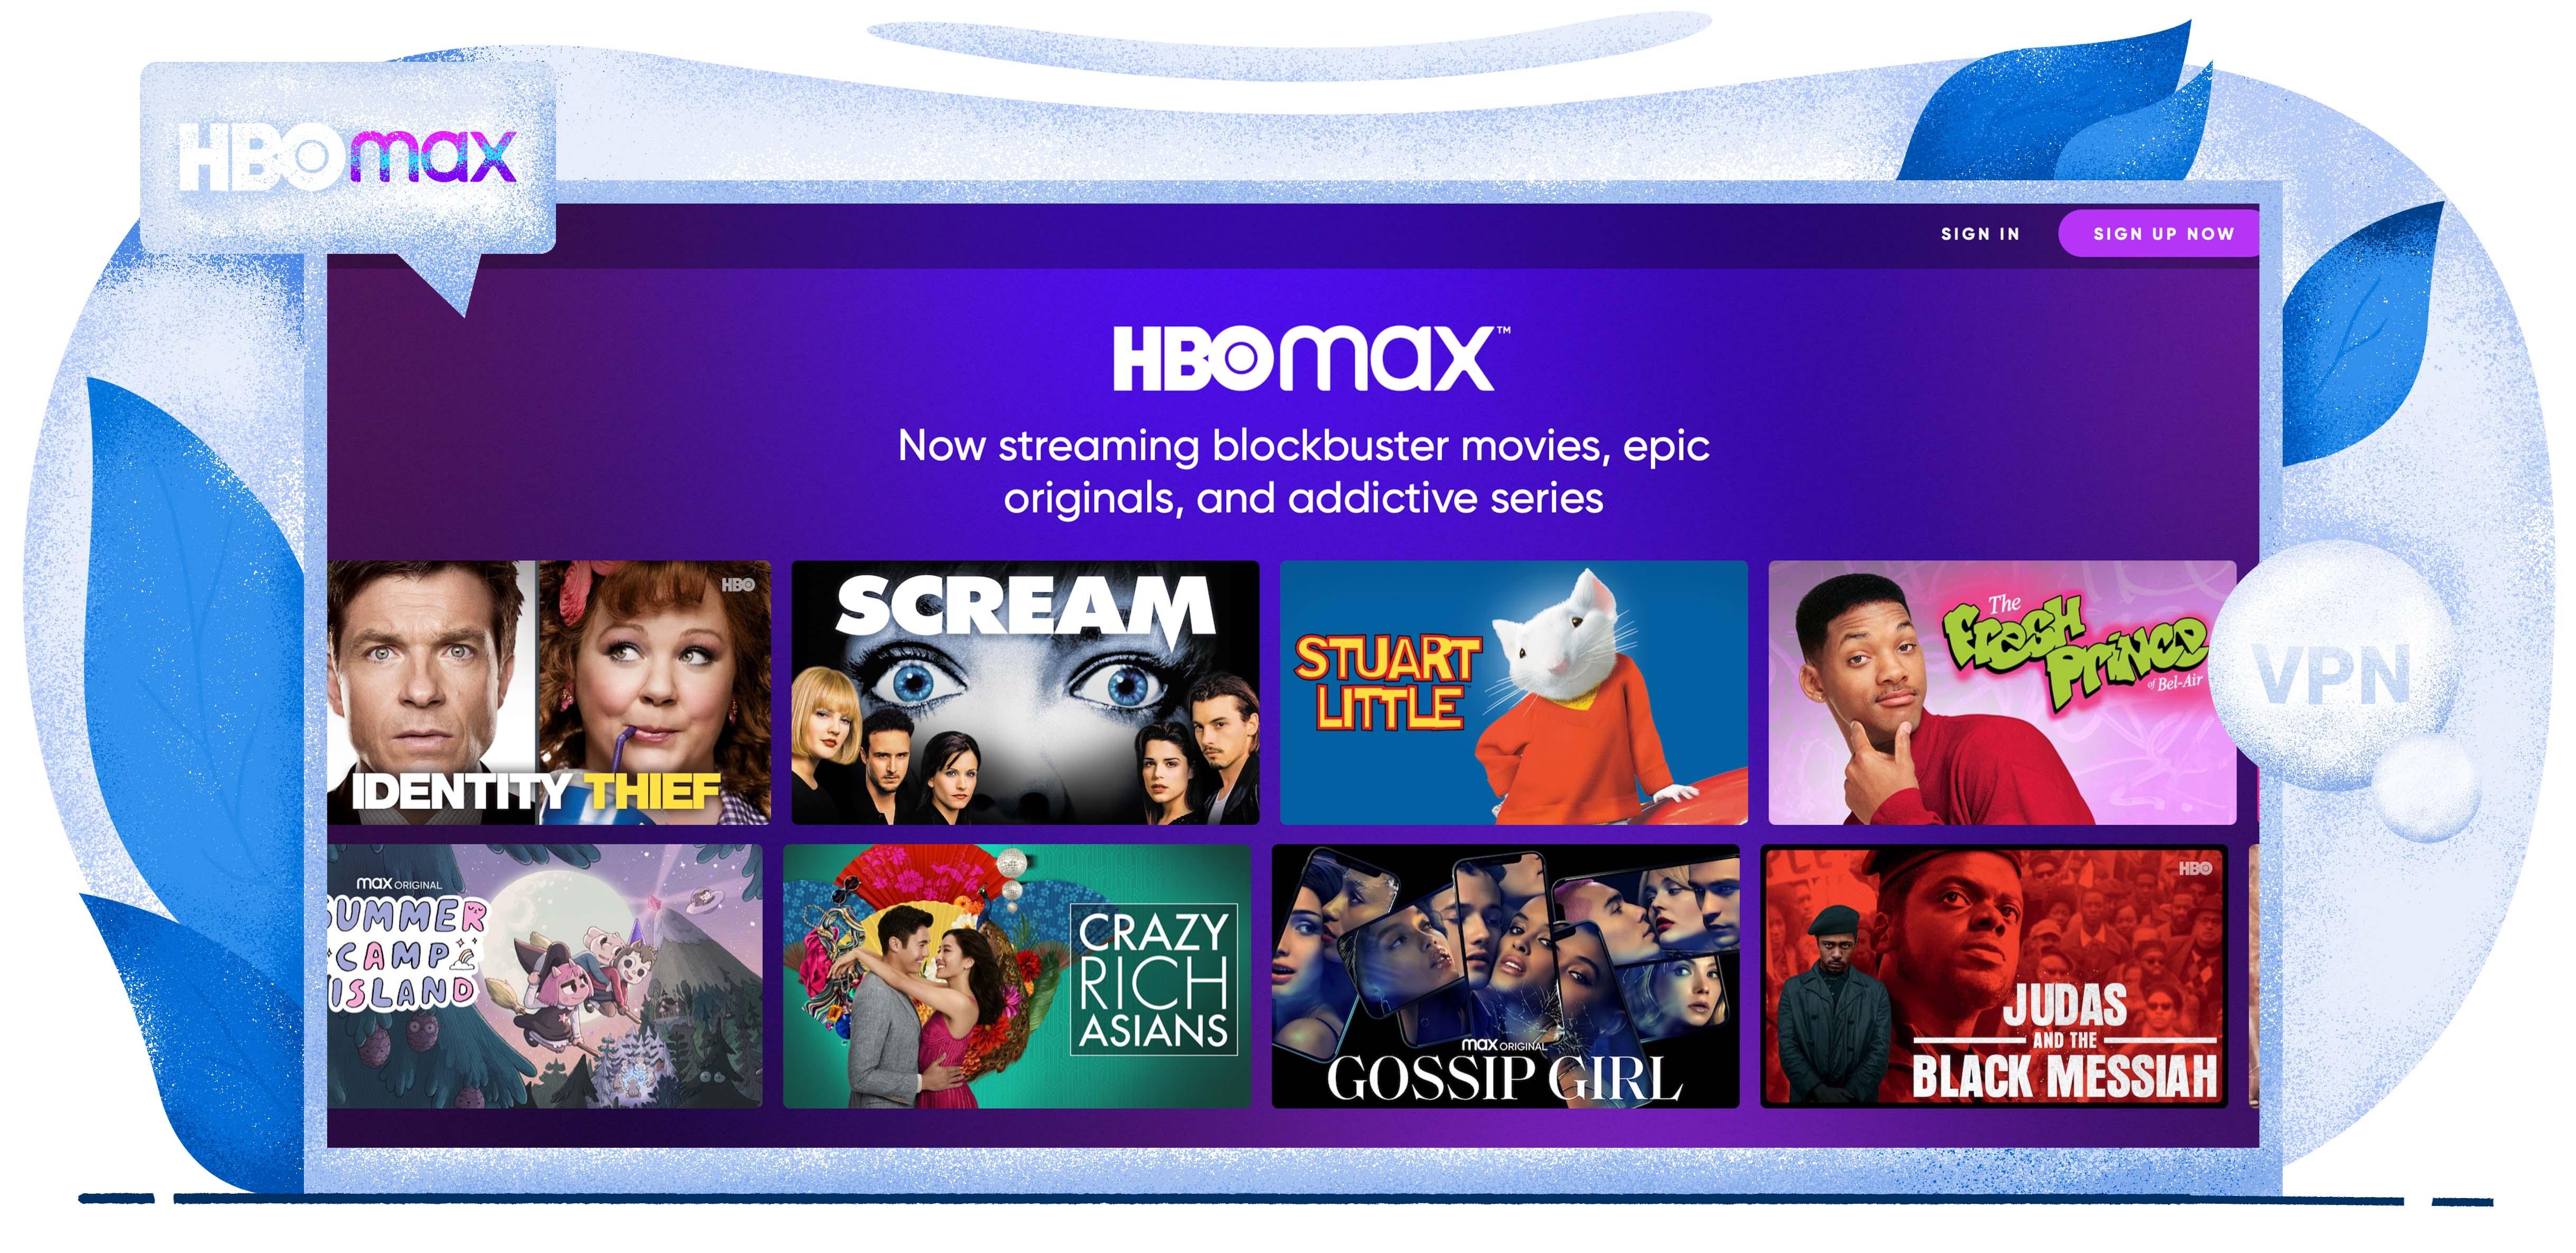 Solo HBO Max trasmette Gossip Girl Reboot